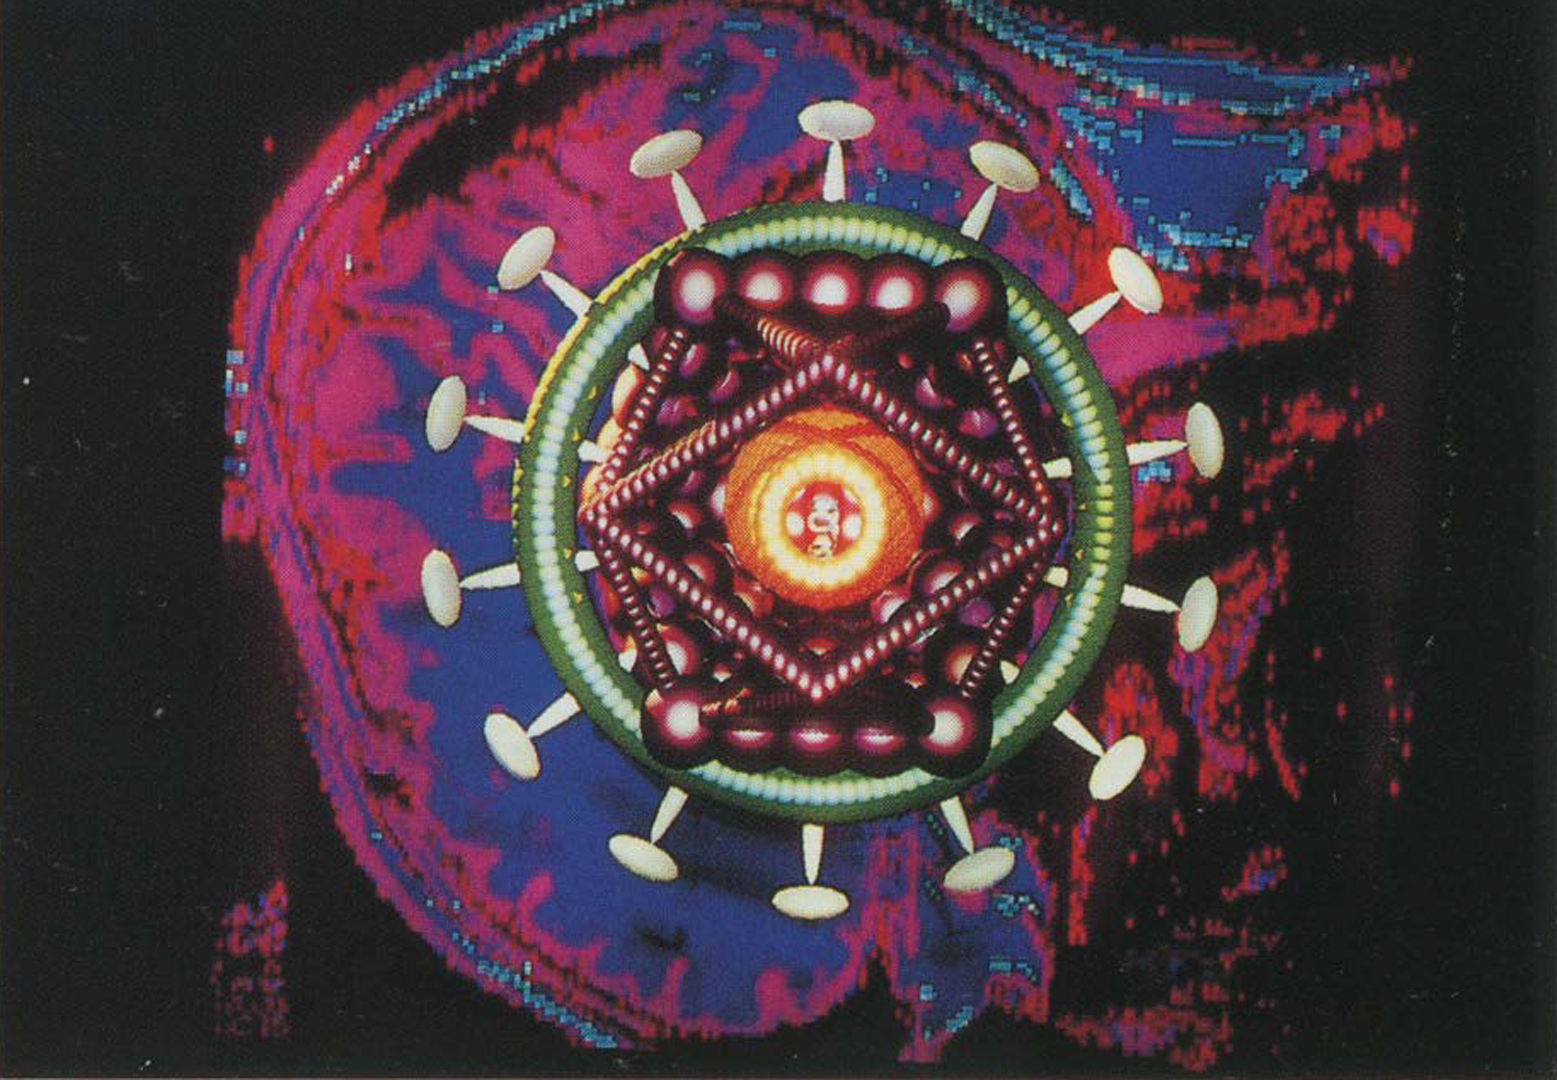 ©1990, (art)n Laboratory